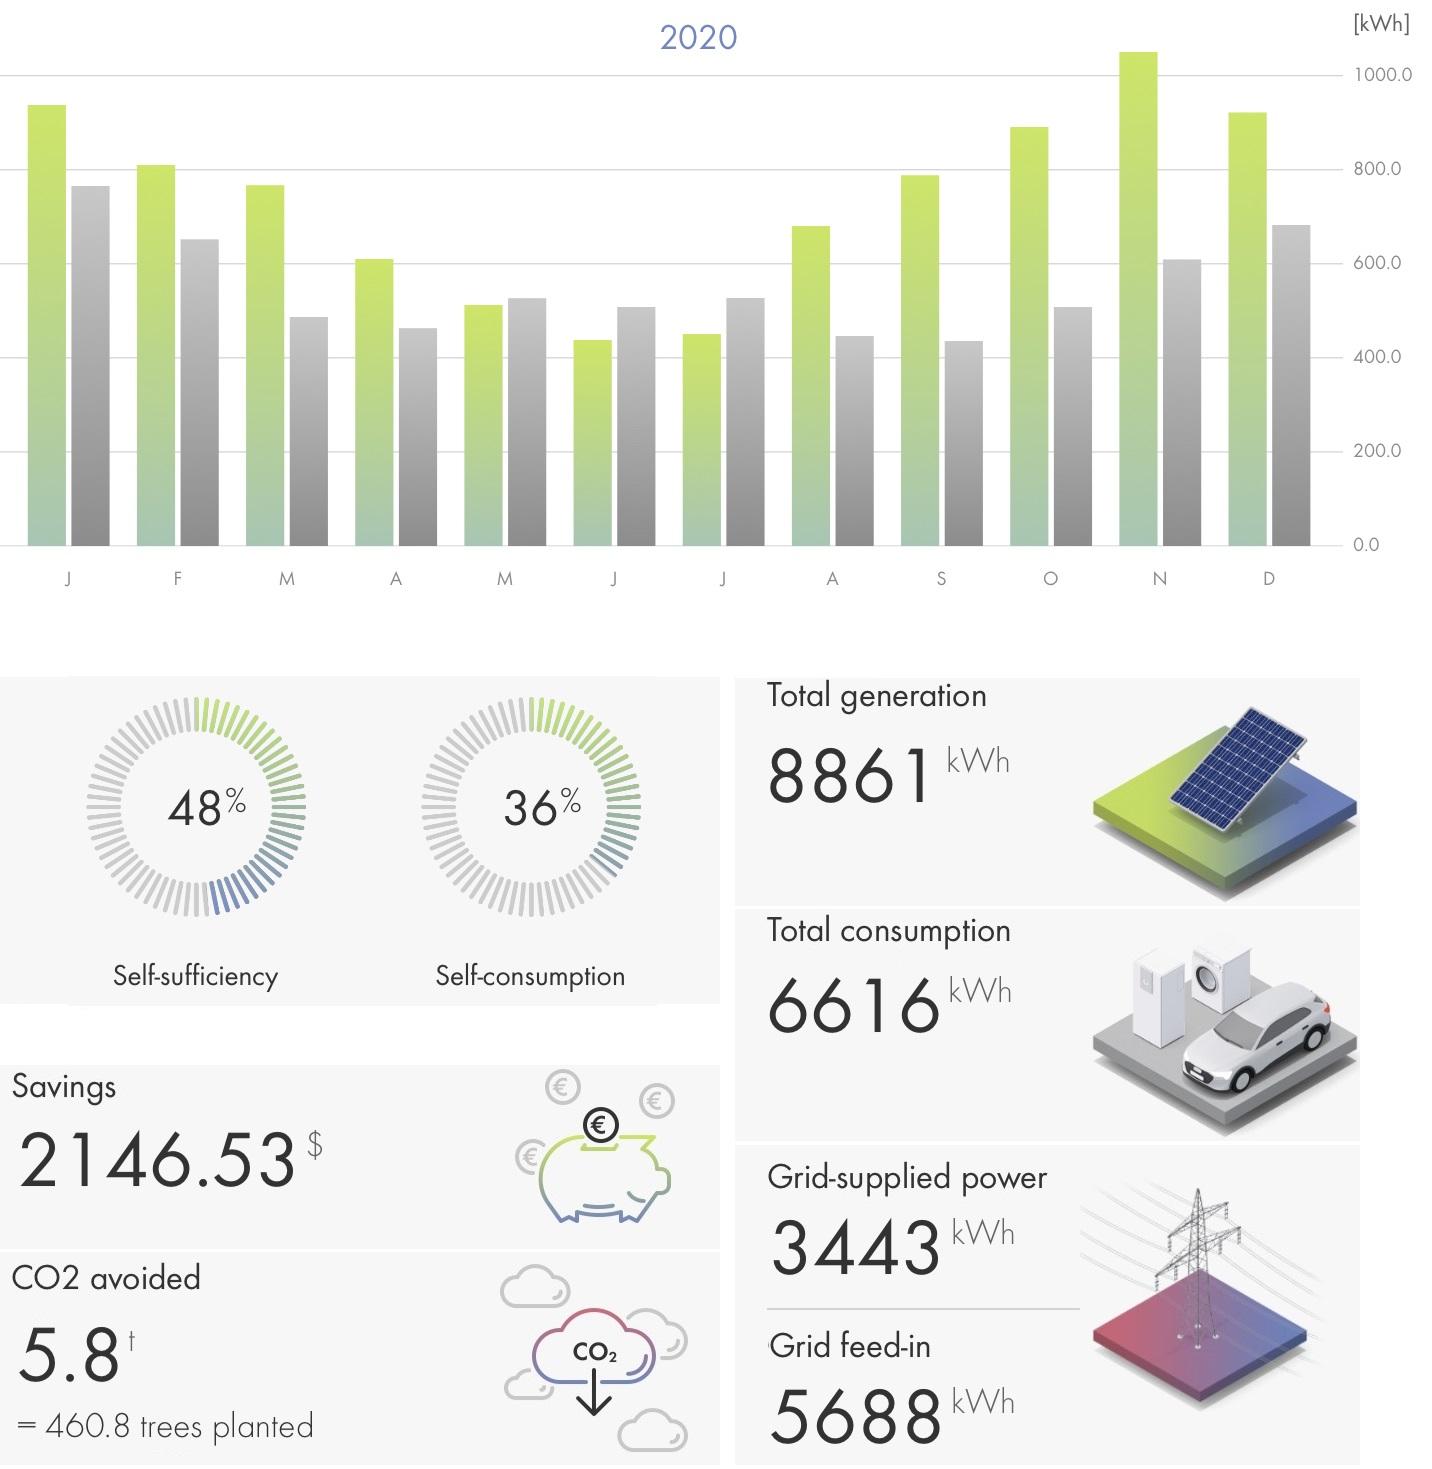 Die SMA Energy visualisiert die Energieflüsse im Haushalt.